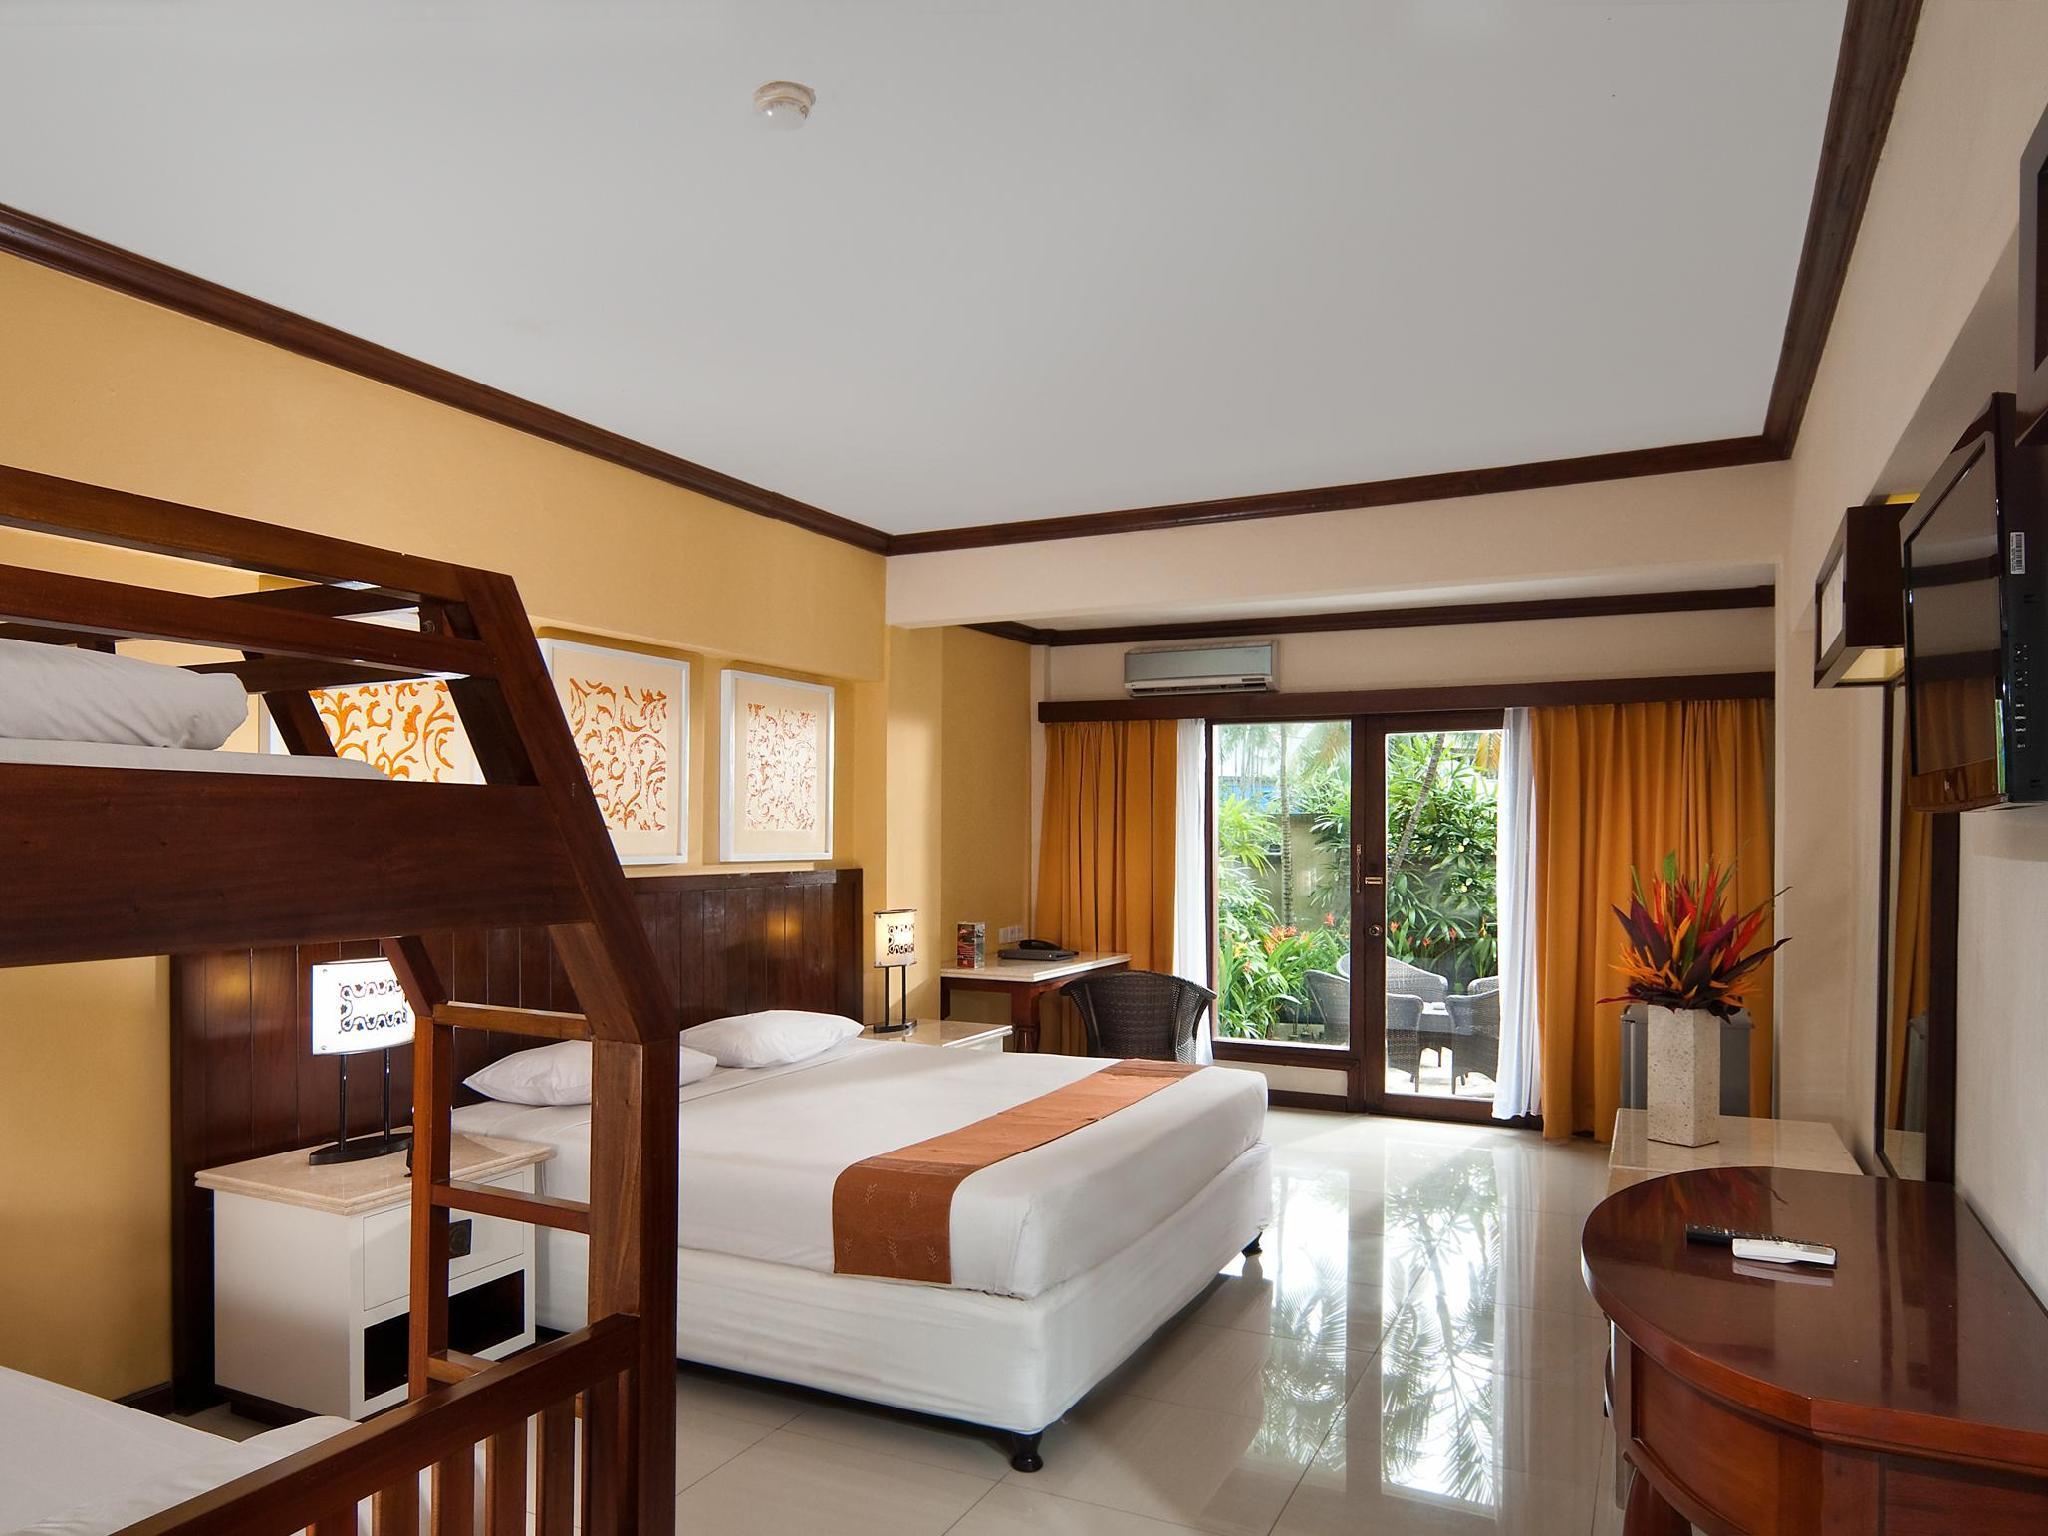 Bali Garden Beach Resort Bali Offers Free Cancellation 2021 Price Lists Reviews